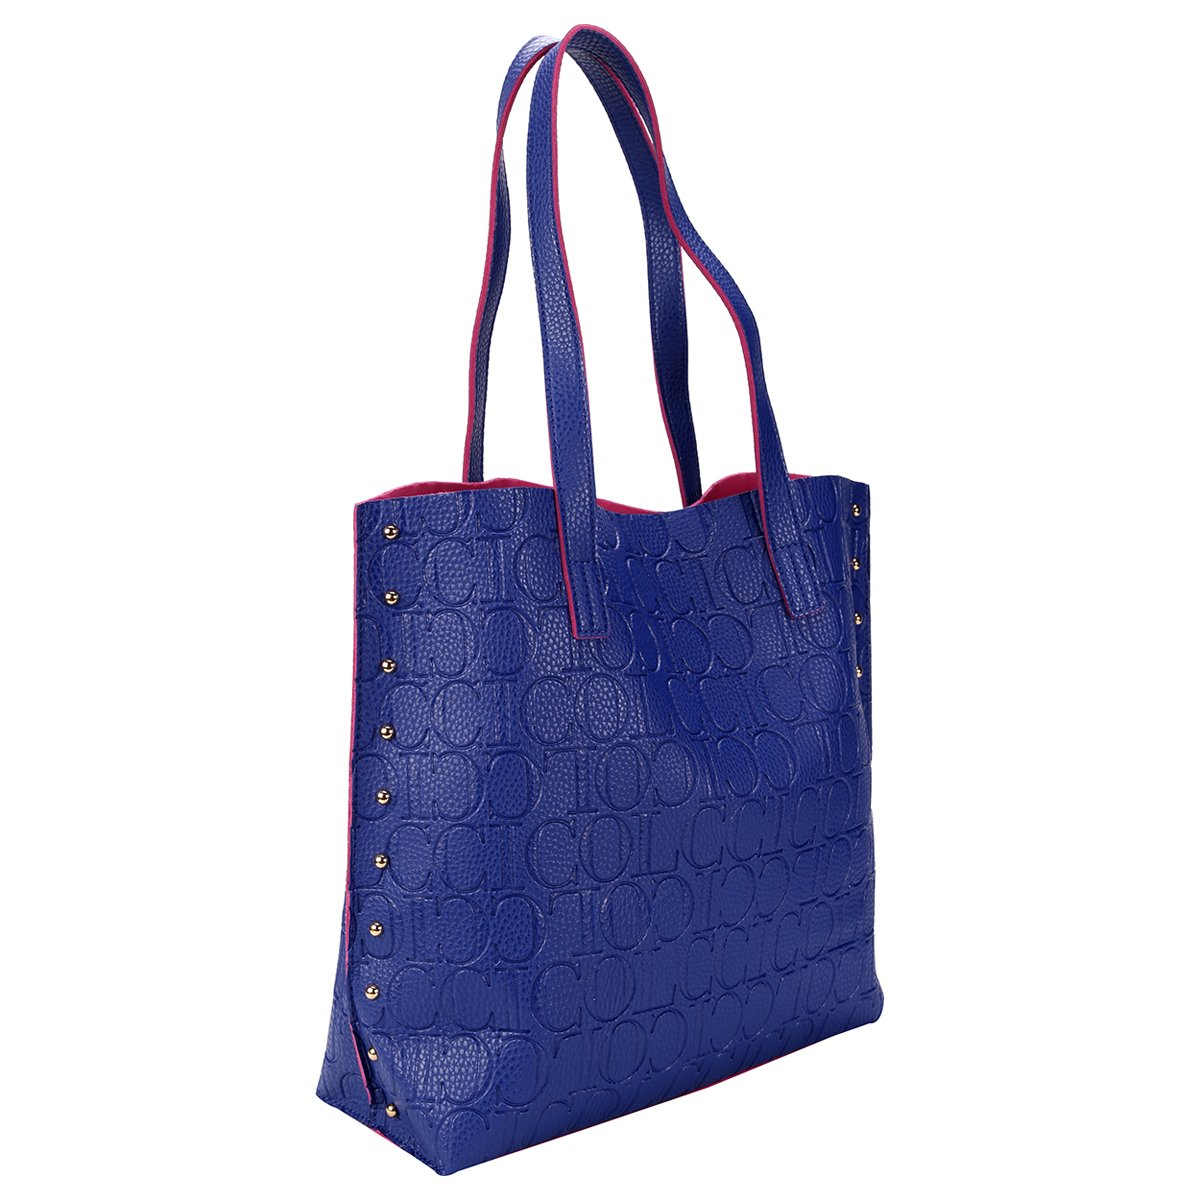 8a2745406 ... Bolsa Colcci Shop. Bag Monograma - Azul. ACESSORIOS; GEN-FEMININO